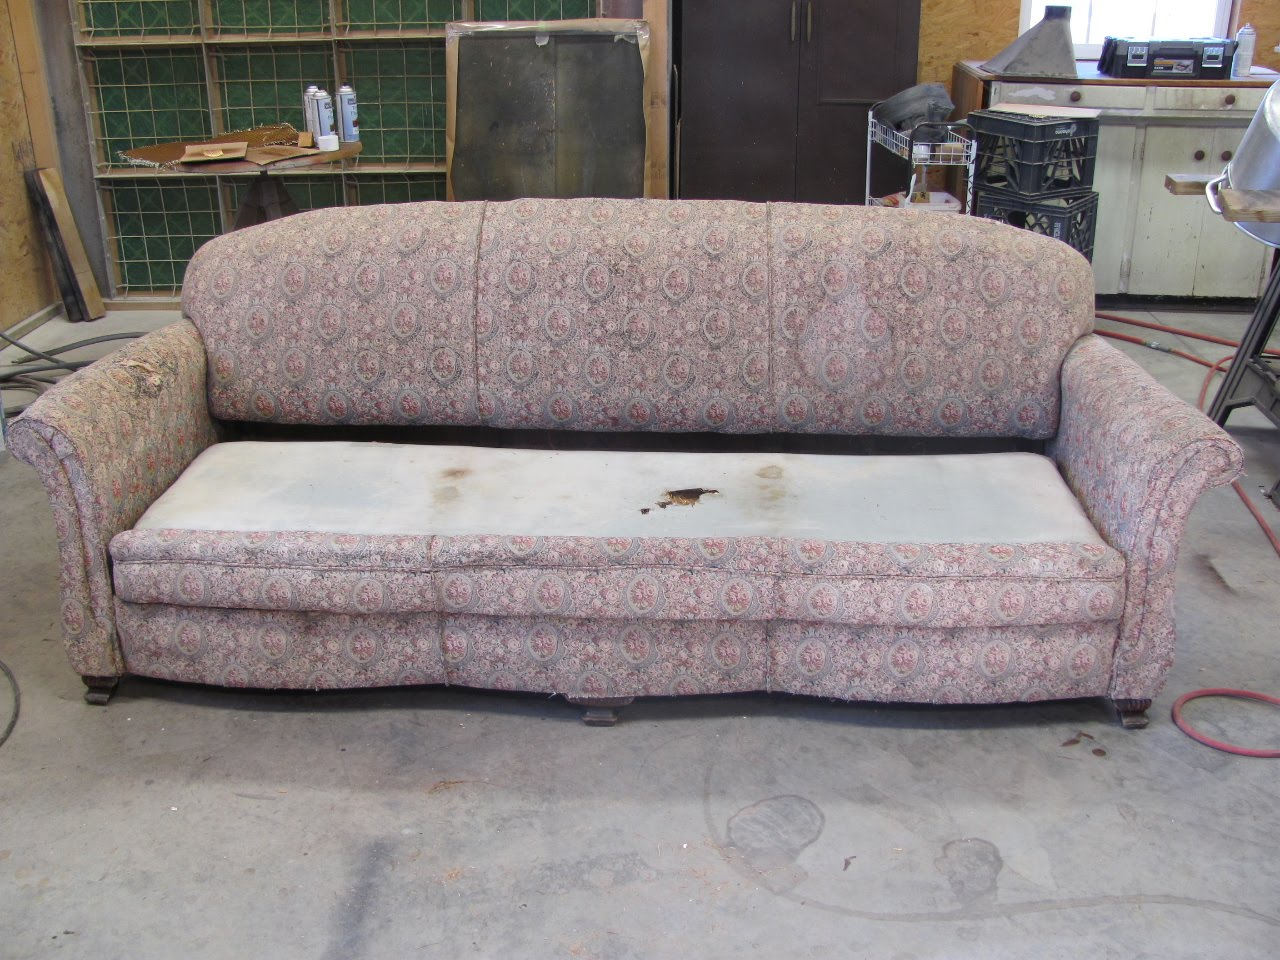 How To Fix A Sofa Spring Chesterfield Gumtree London Repair Sleeper Springs